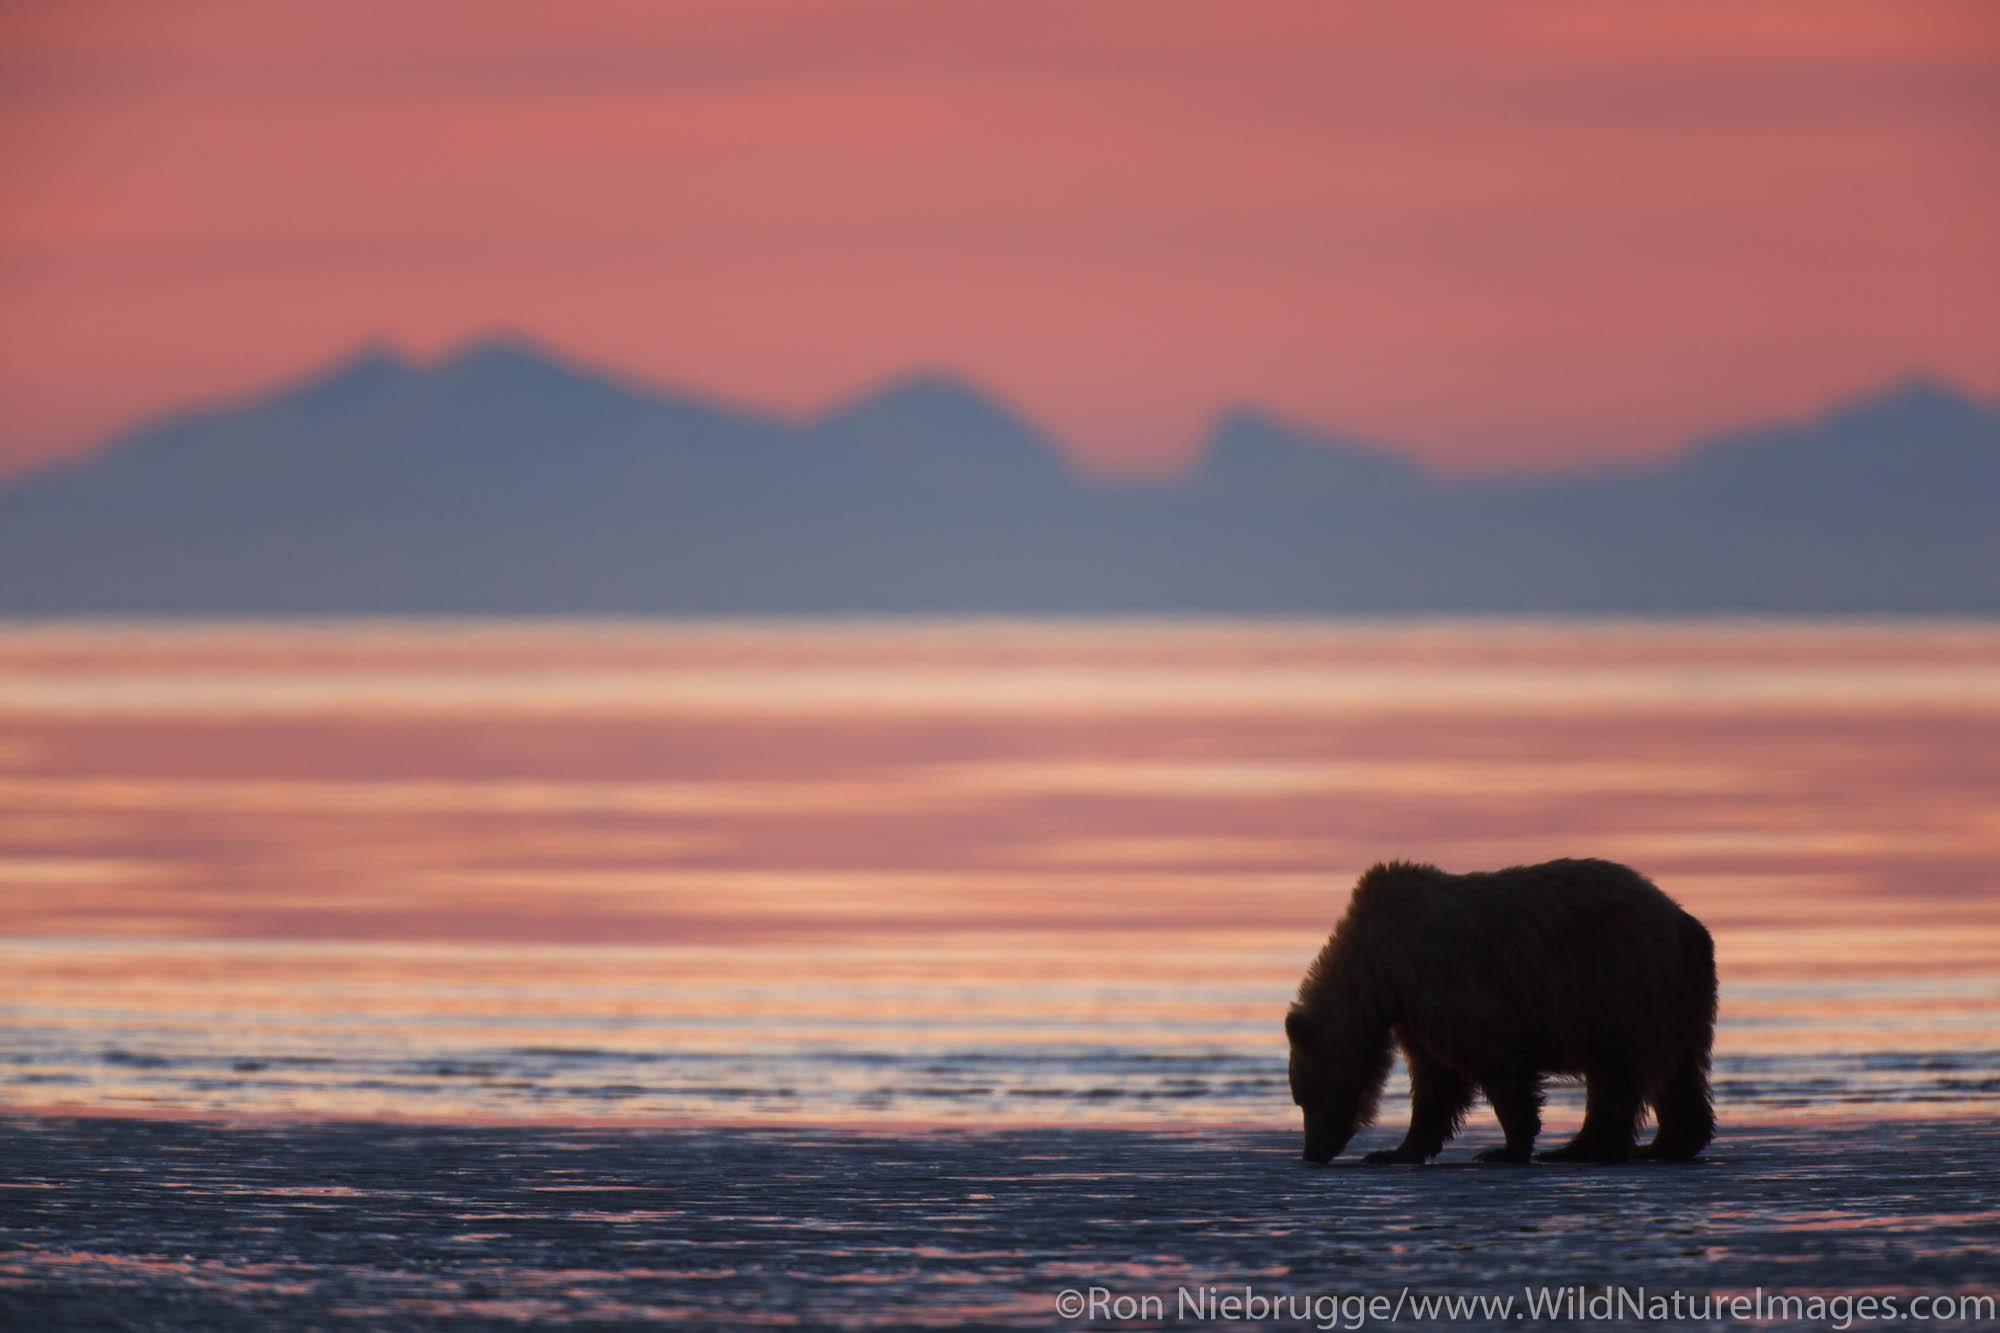 Brown or Grizzly Bear silhouetted against sunrise sky, Lake Clark National Park, Alaska.